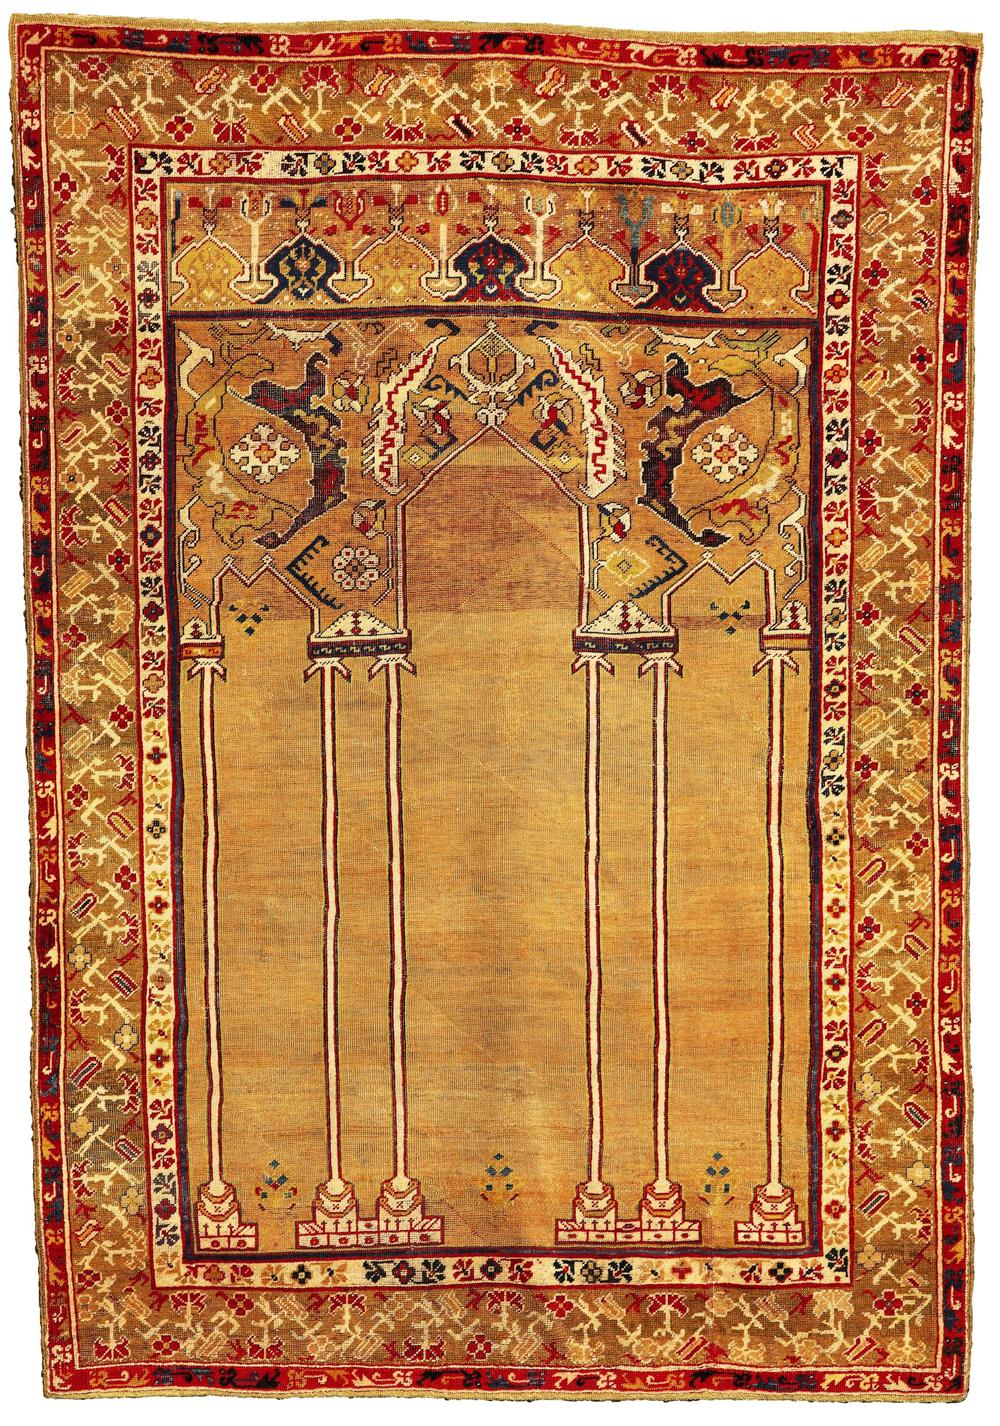 Sotheby's Prayer Rug